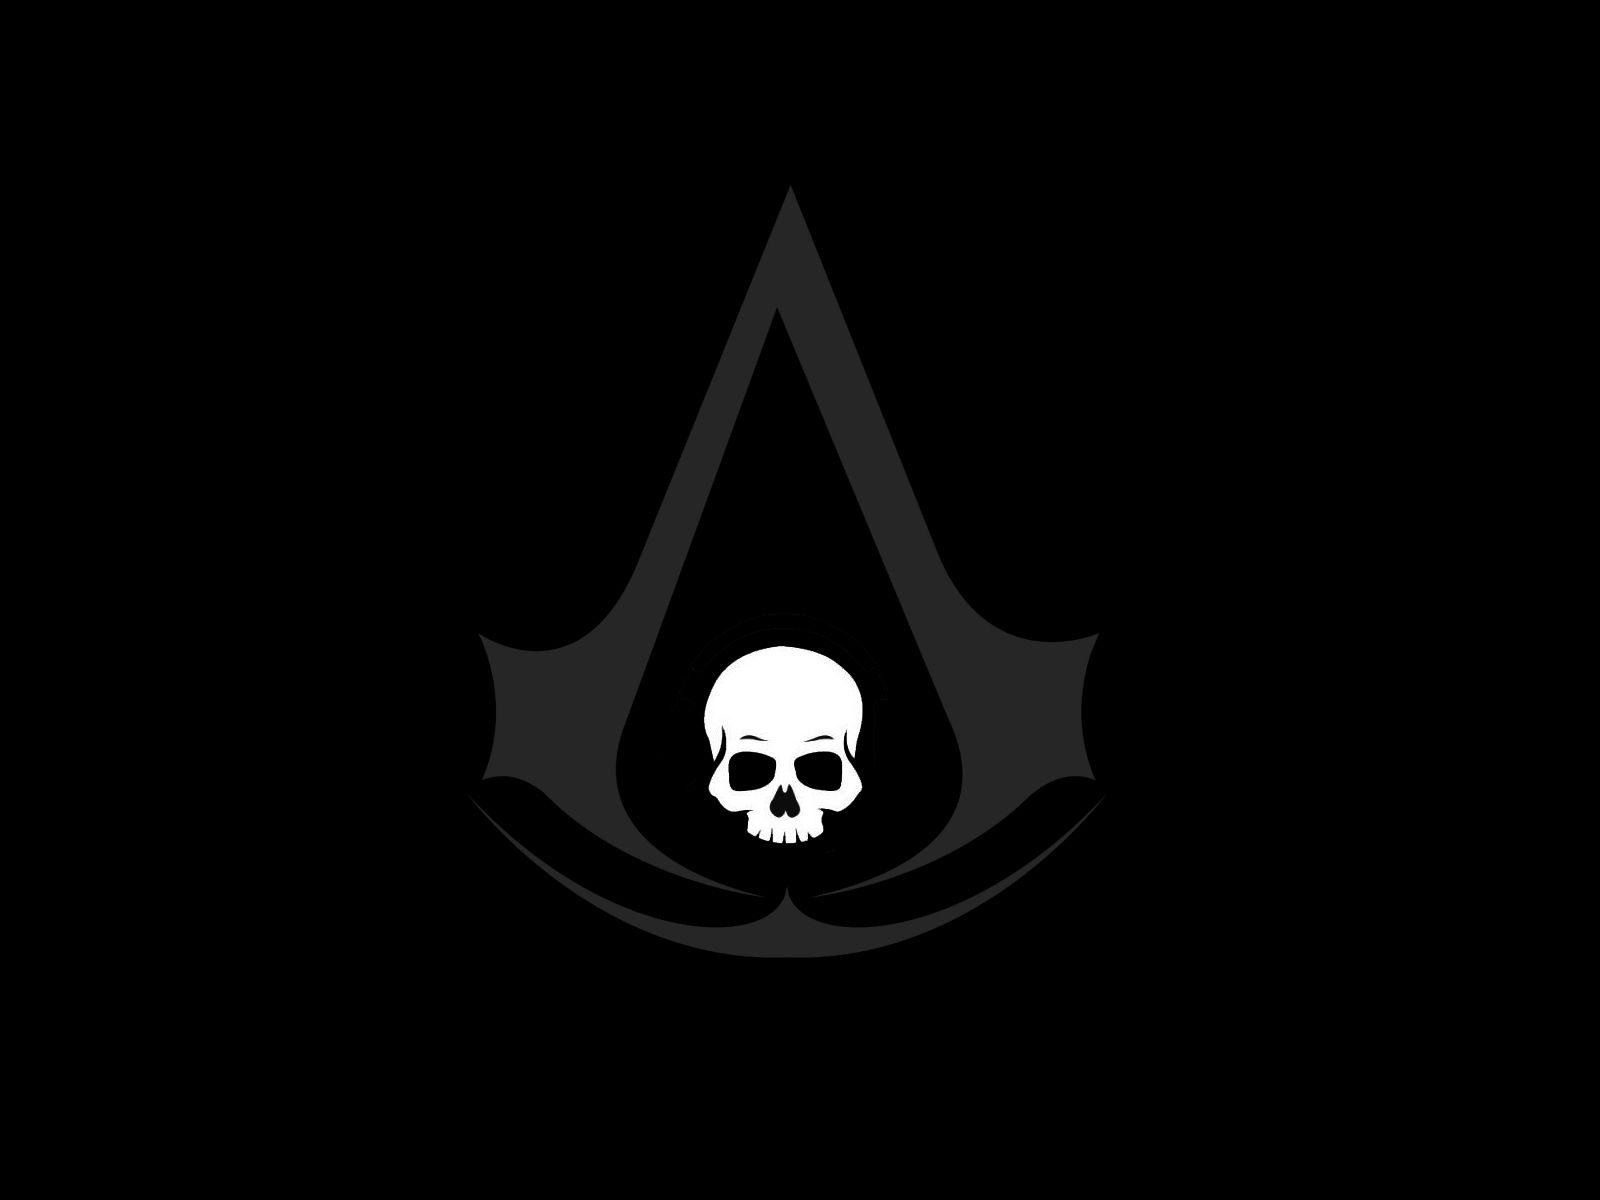 Assassin S Creed Iv Black Flag Logo 2 Assassins Creed